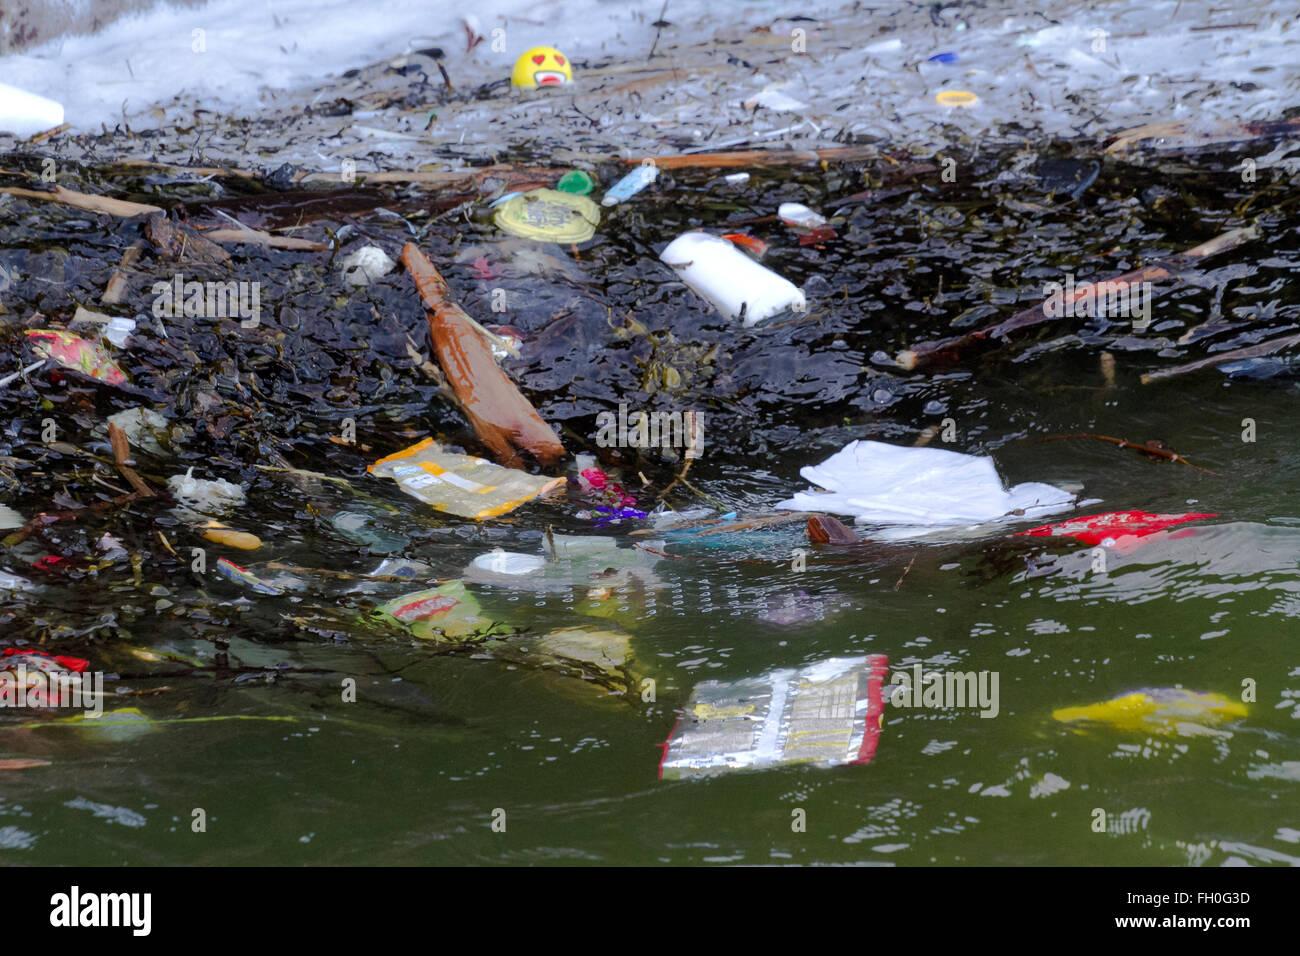 Washed up beach litter debris pollution ocean plastic plastics at Hoylake, Wallasey, UK - Stock Image